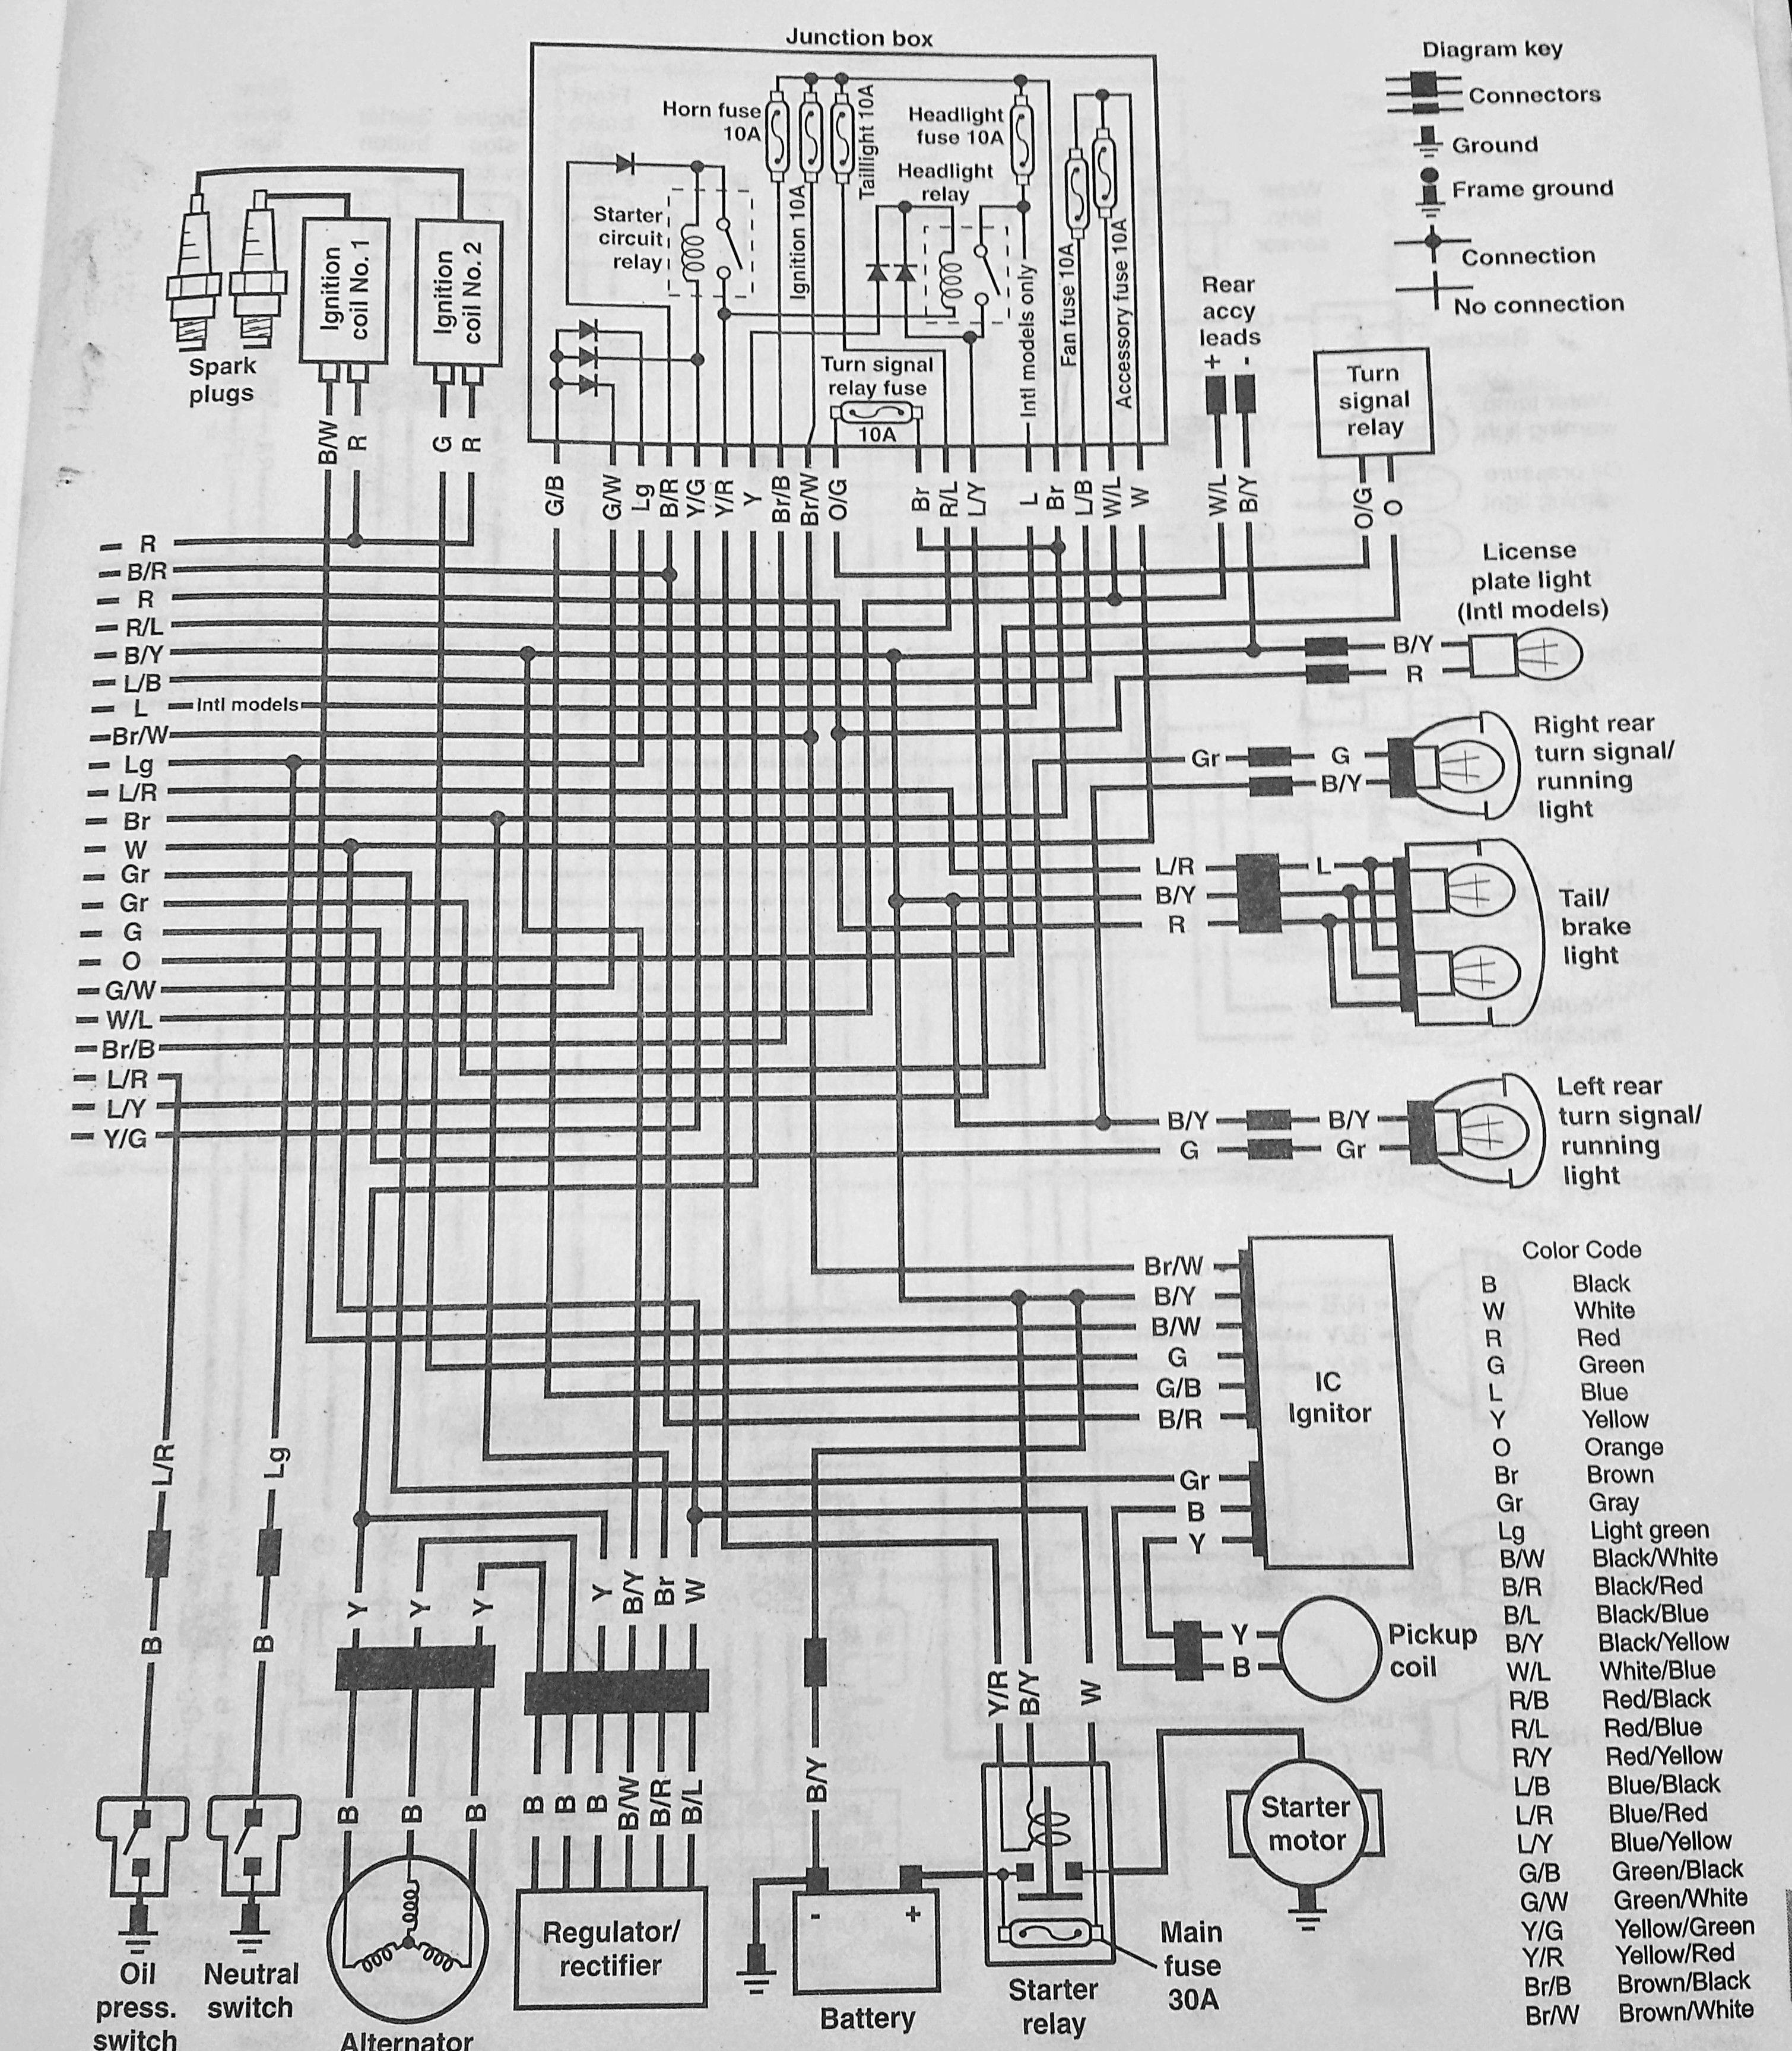 A82709 Kawasaki Zx7r Wiring Diagram   Wiring Resources on yamaha fz1 wiring diagram, honda rc51 wiring diagram, honda cbr600rr wiring diagram, zx7r wiring diagram, kawasaki zx7 specifications, honda st1100 wiring diagram, honda cbr900 wiring diagram,